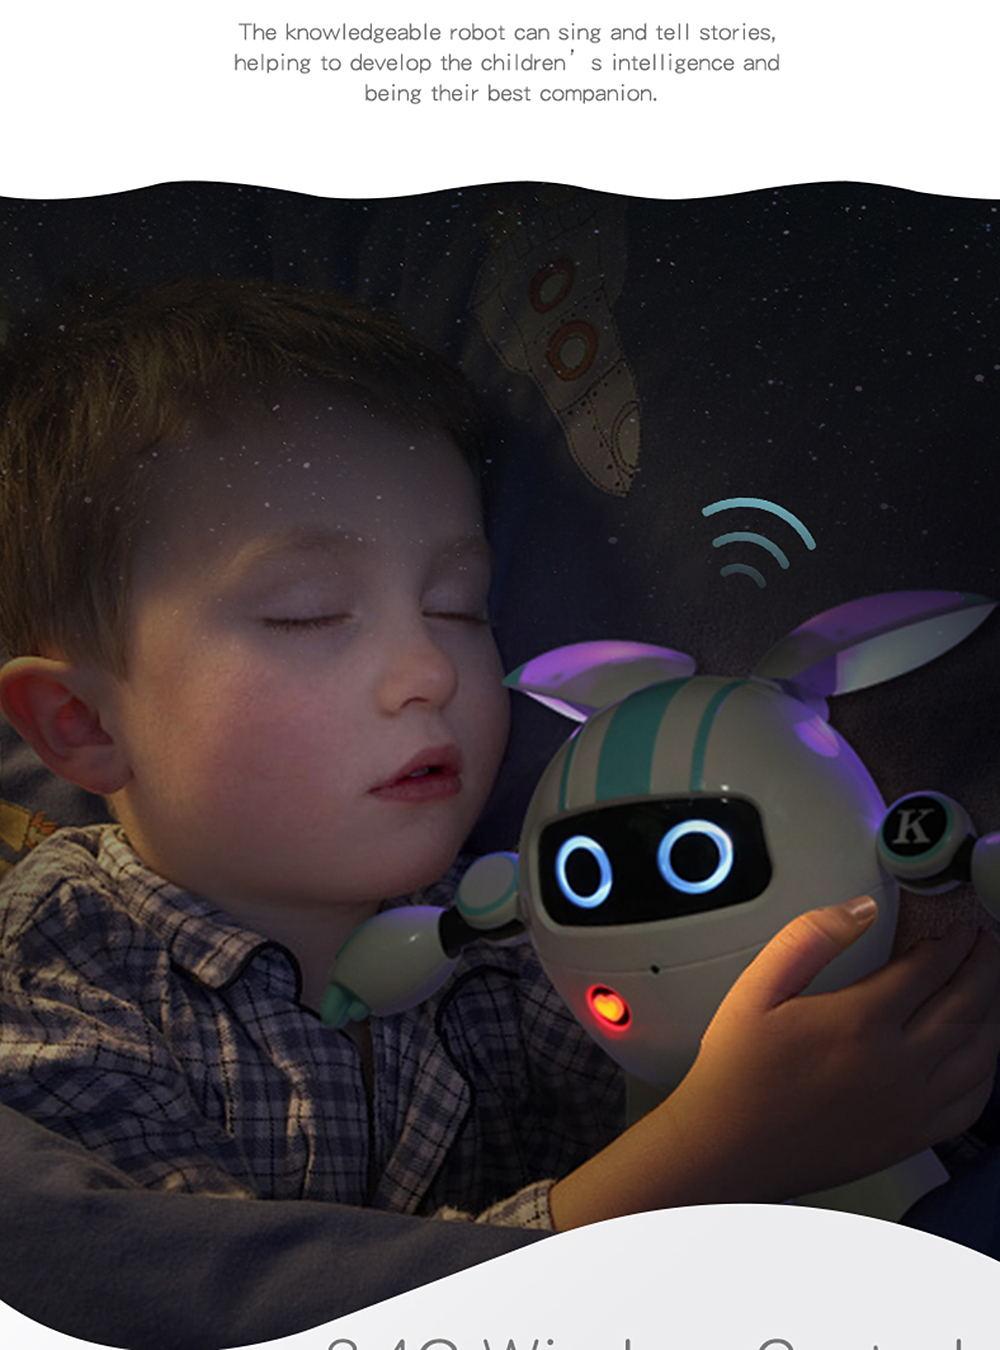 jjrc r14 smart robot toy